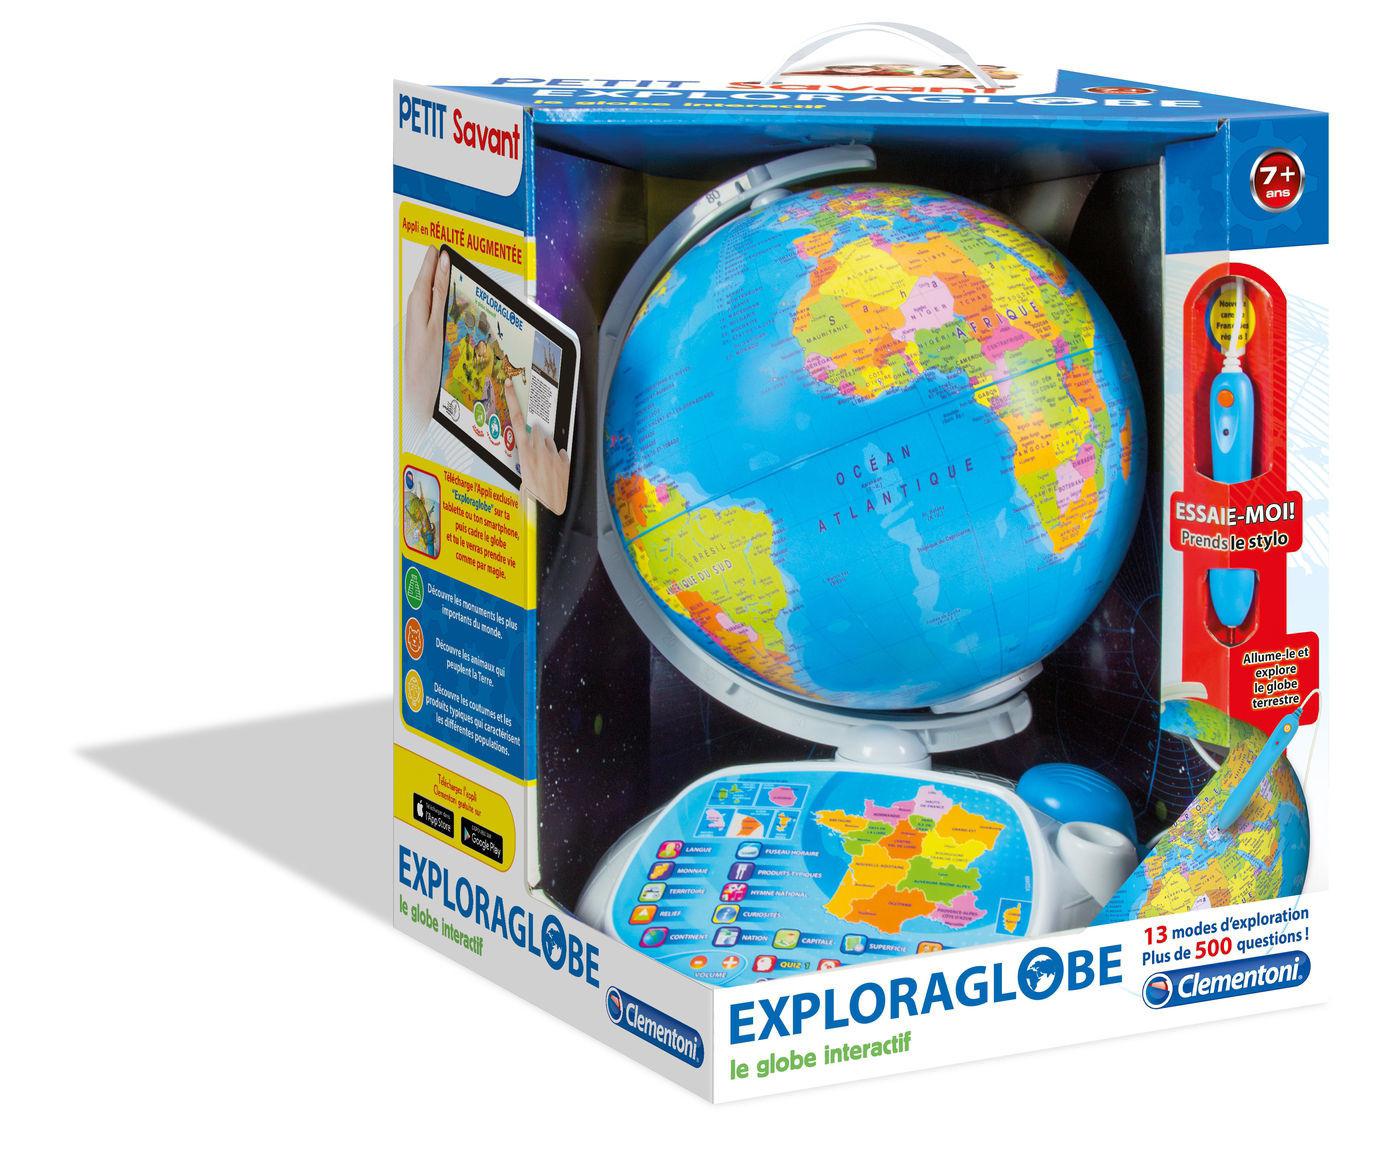 Image de Clementoni Exploraglobe - Le globe interactif 52202